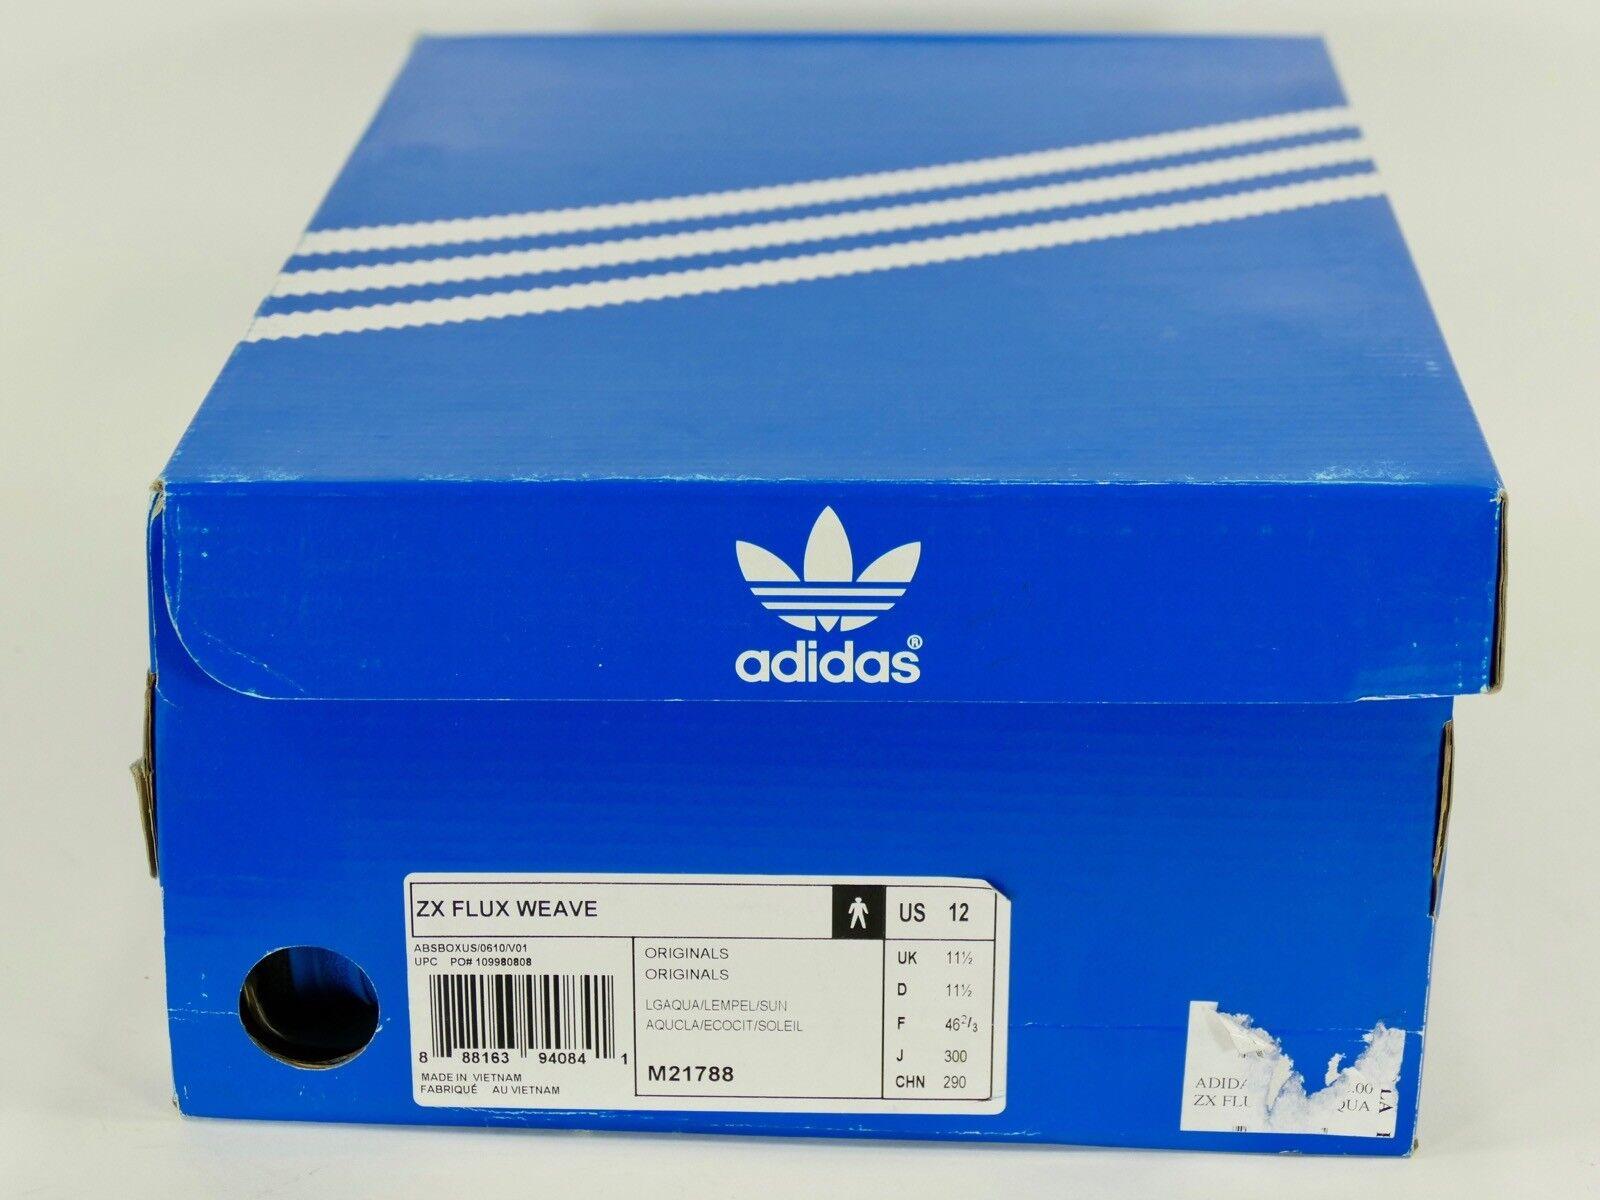 Adidas ZX Flux Weave light aqualemon peelsun 2014 8000 og originals m21788